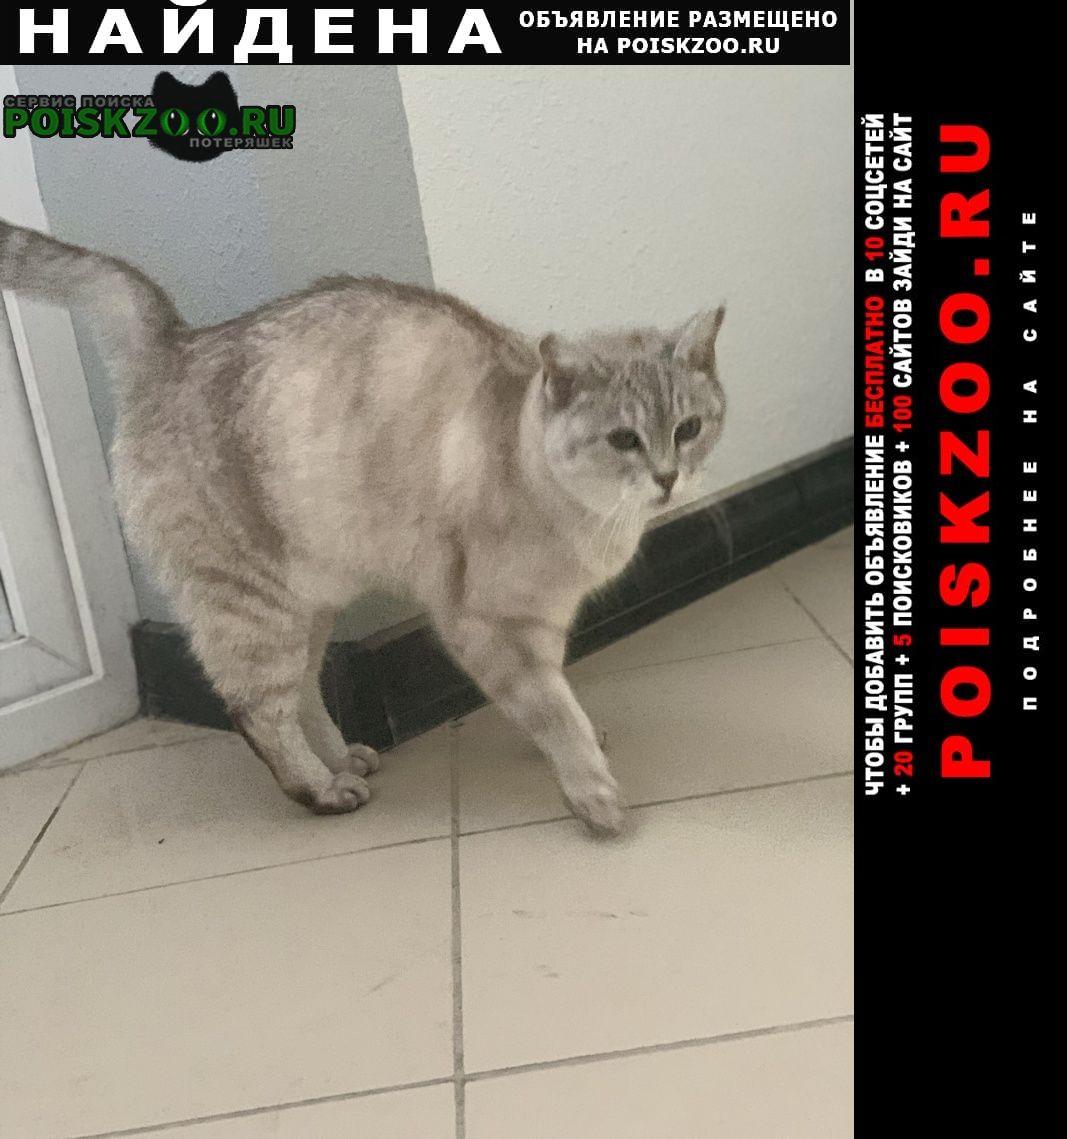 Найдена кошка Казань